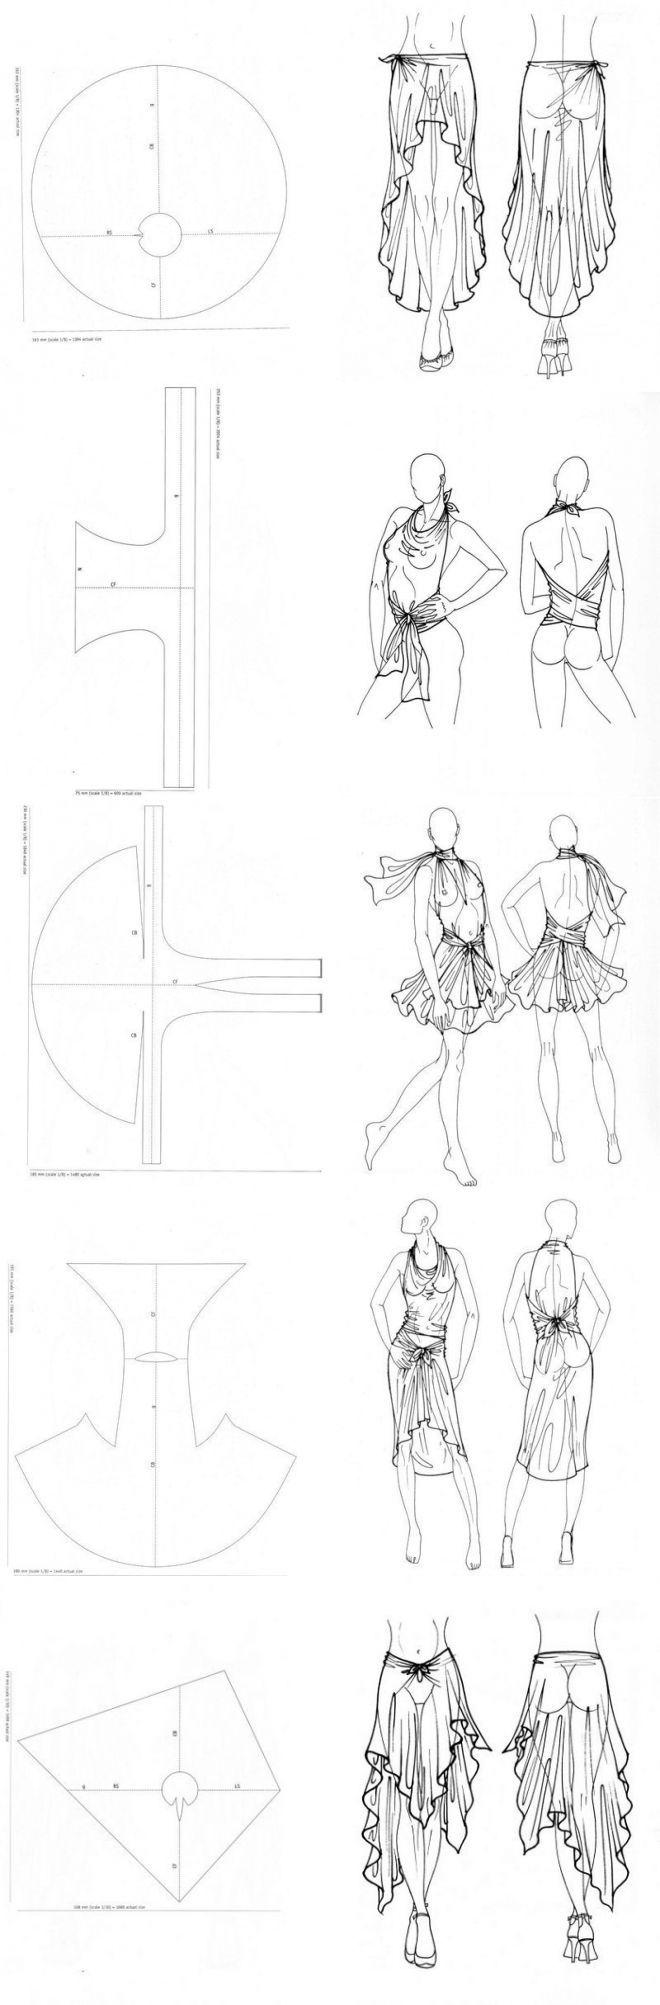 10 летних нарядов, которые не нужно шить! | thePO.ST... lina neva, her post is in Russian, but she has other diagrams like these on postila.ru